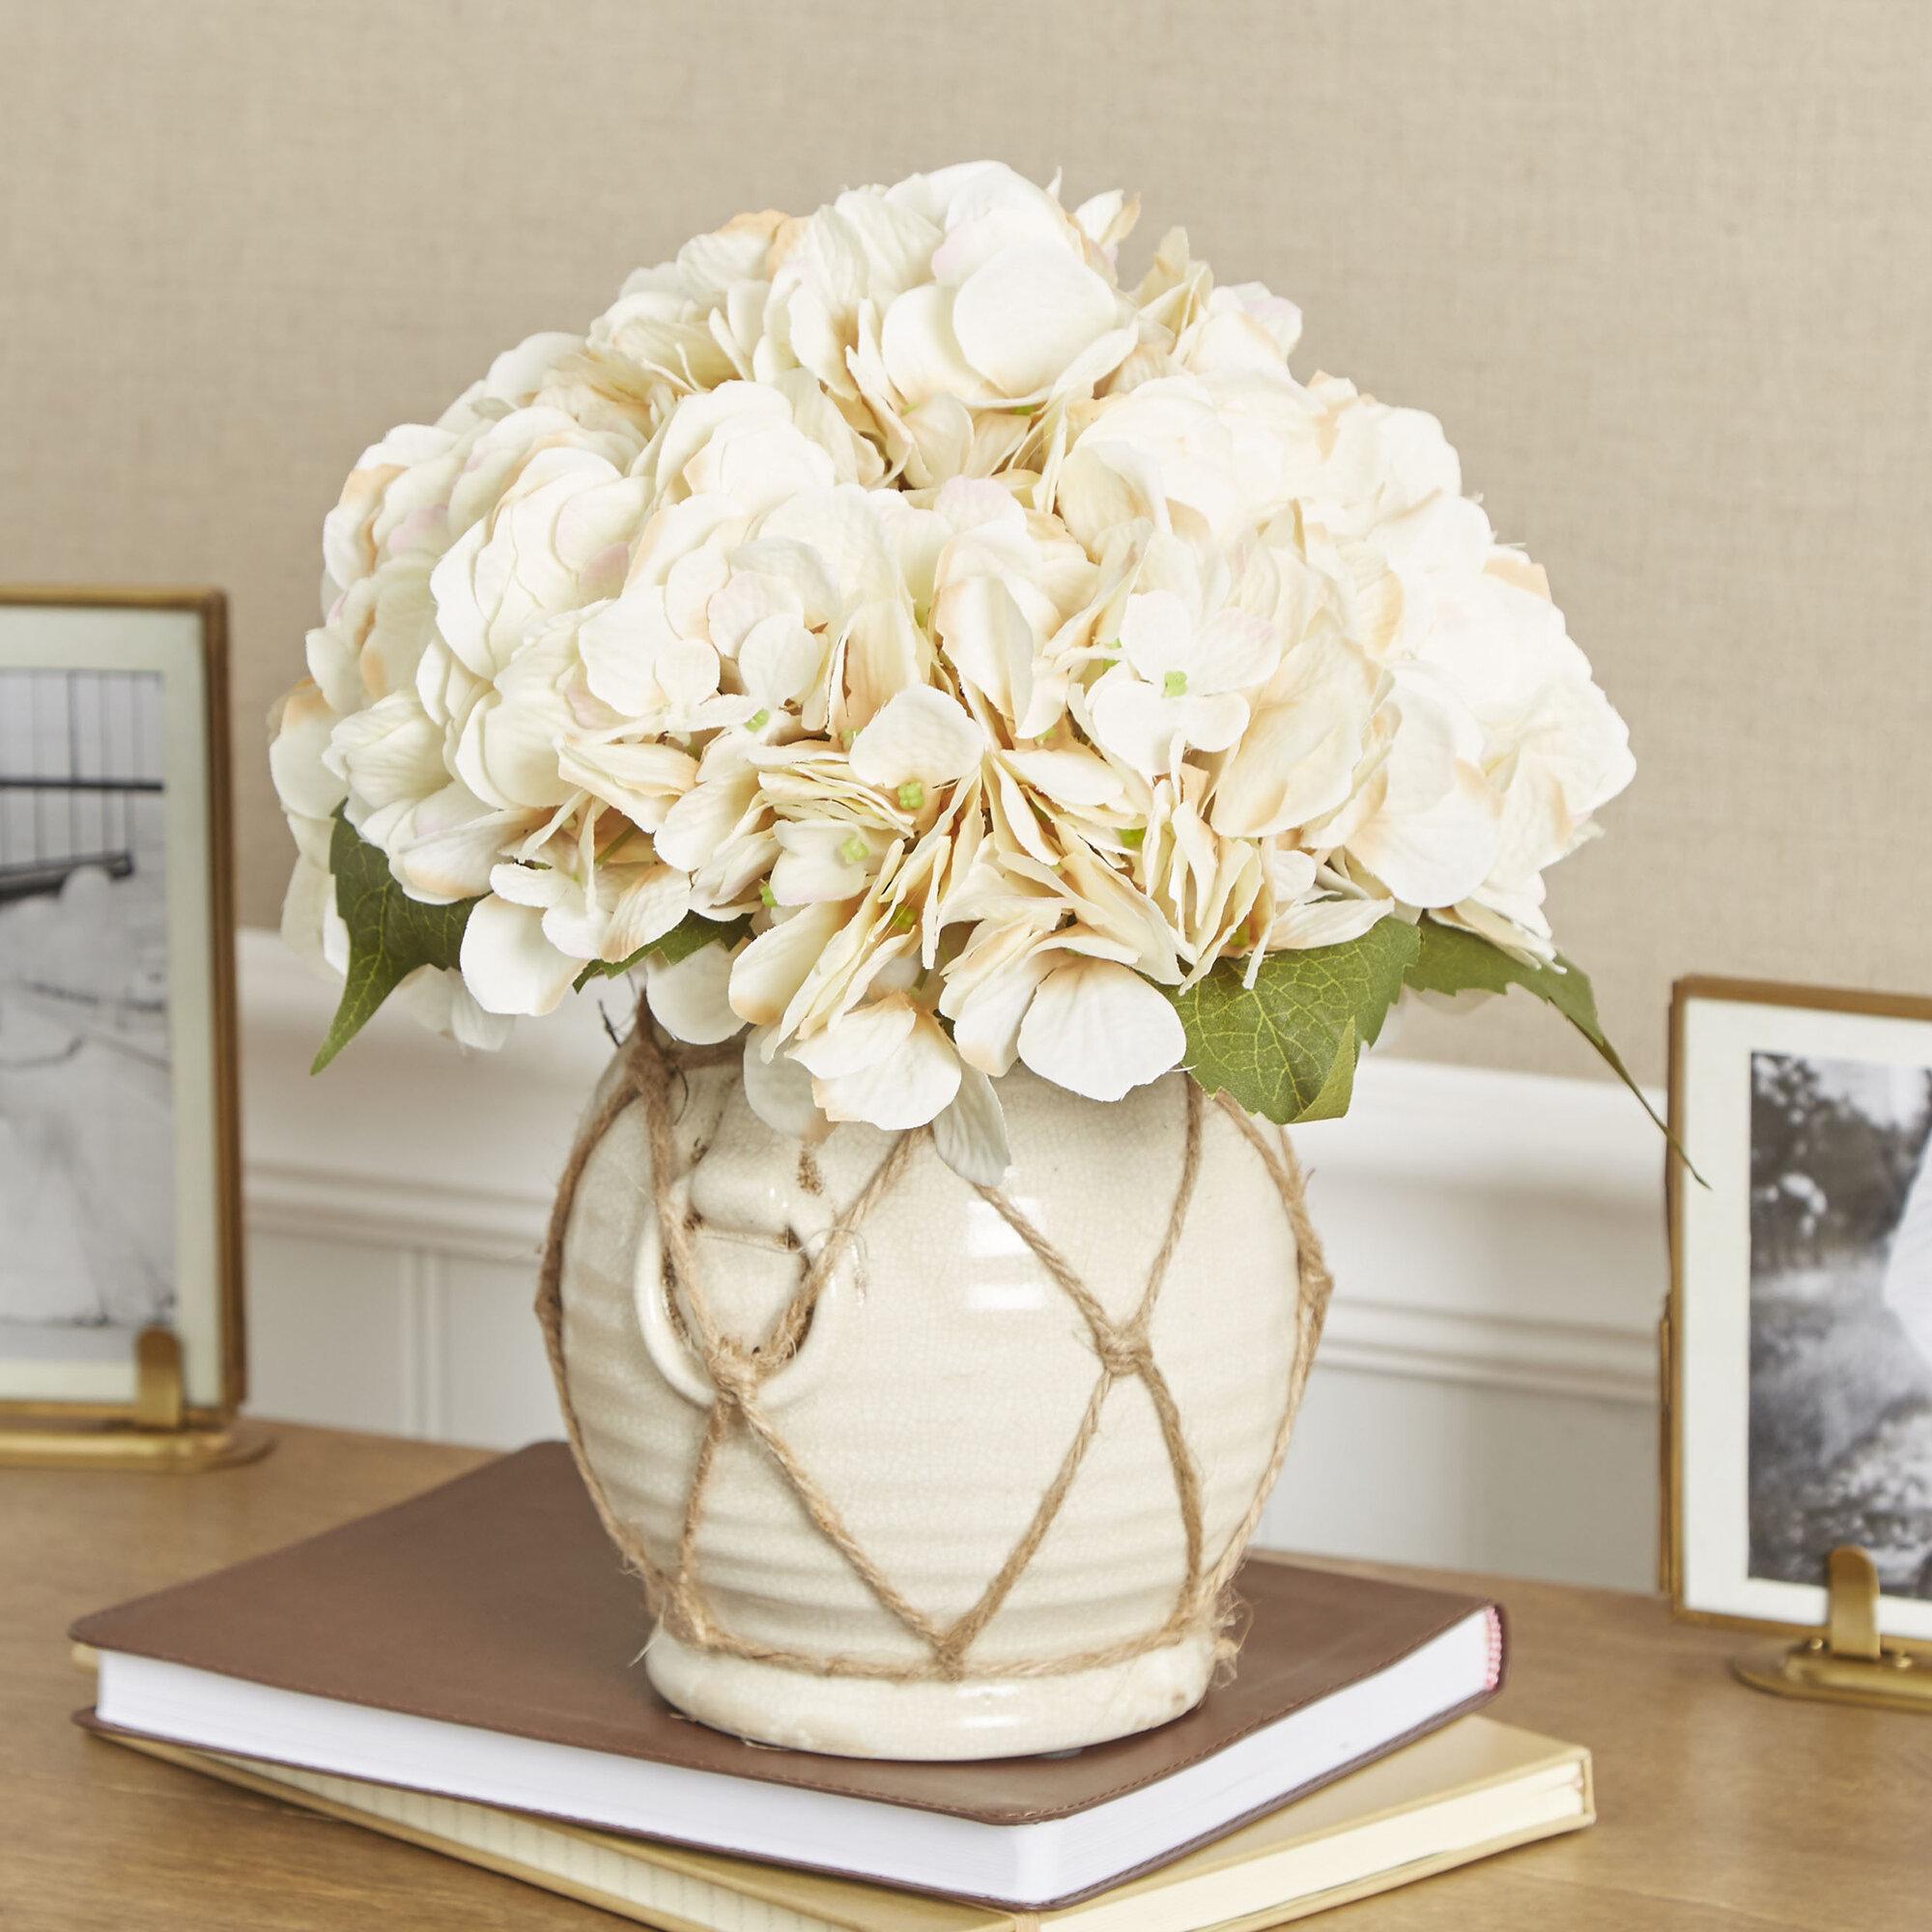 Charlton Home Faux Hydrangea Floral Arrangement In Twine Wrapped Vase Reviews Wayfair Ca